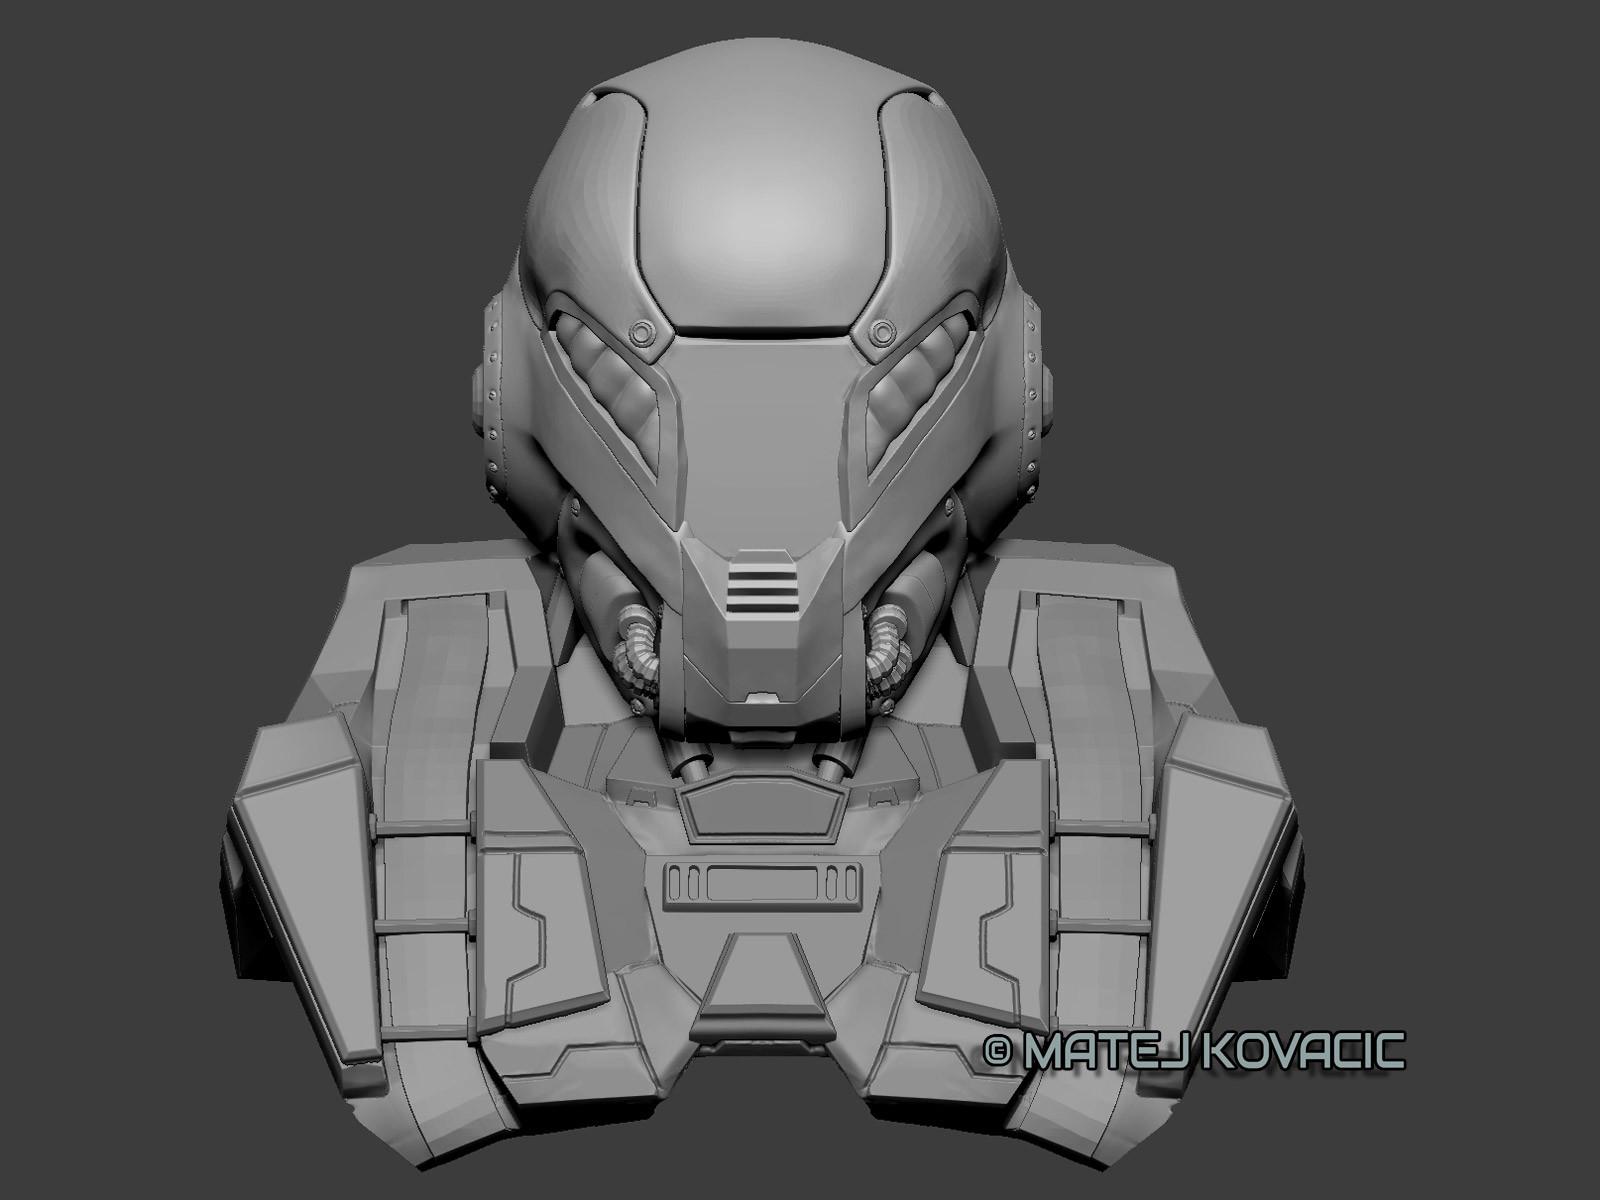 Matej kovacic sci fi helmet rx 51 zb front2 by matej kovacic